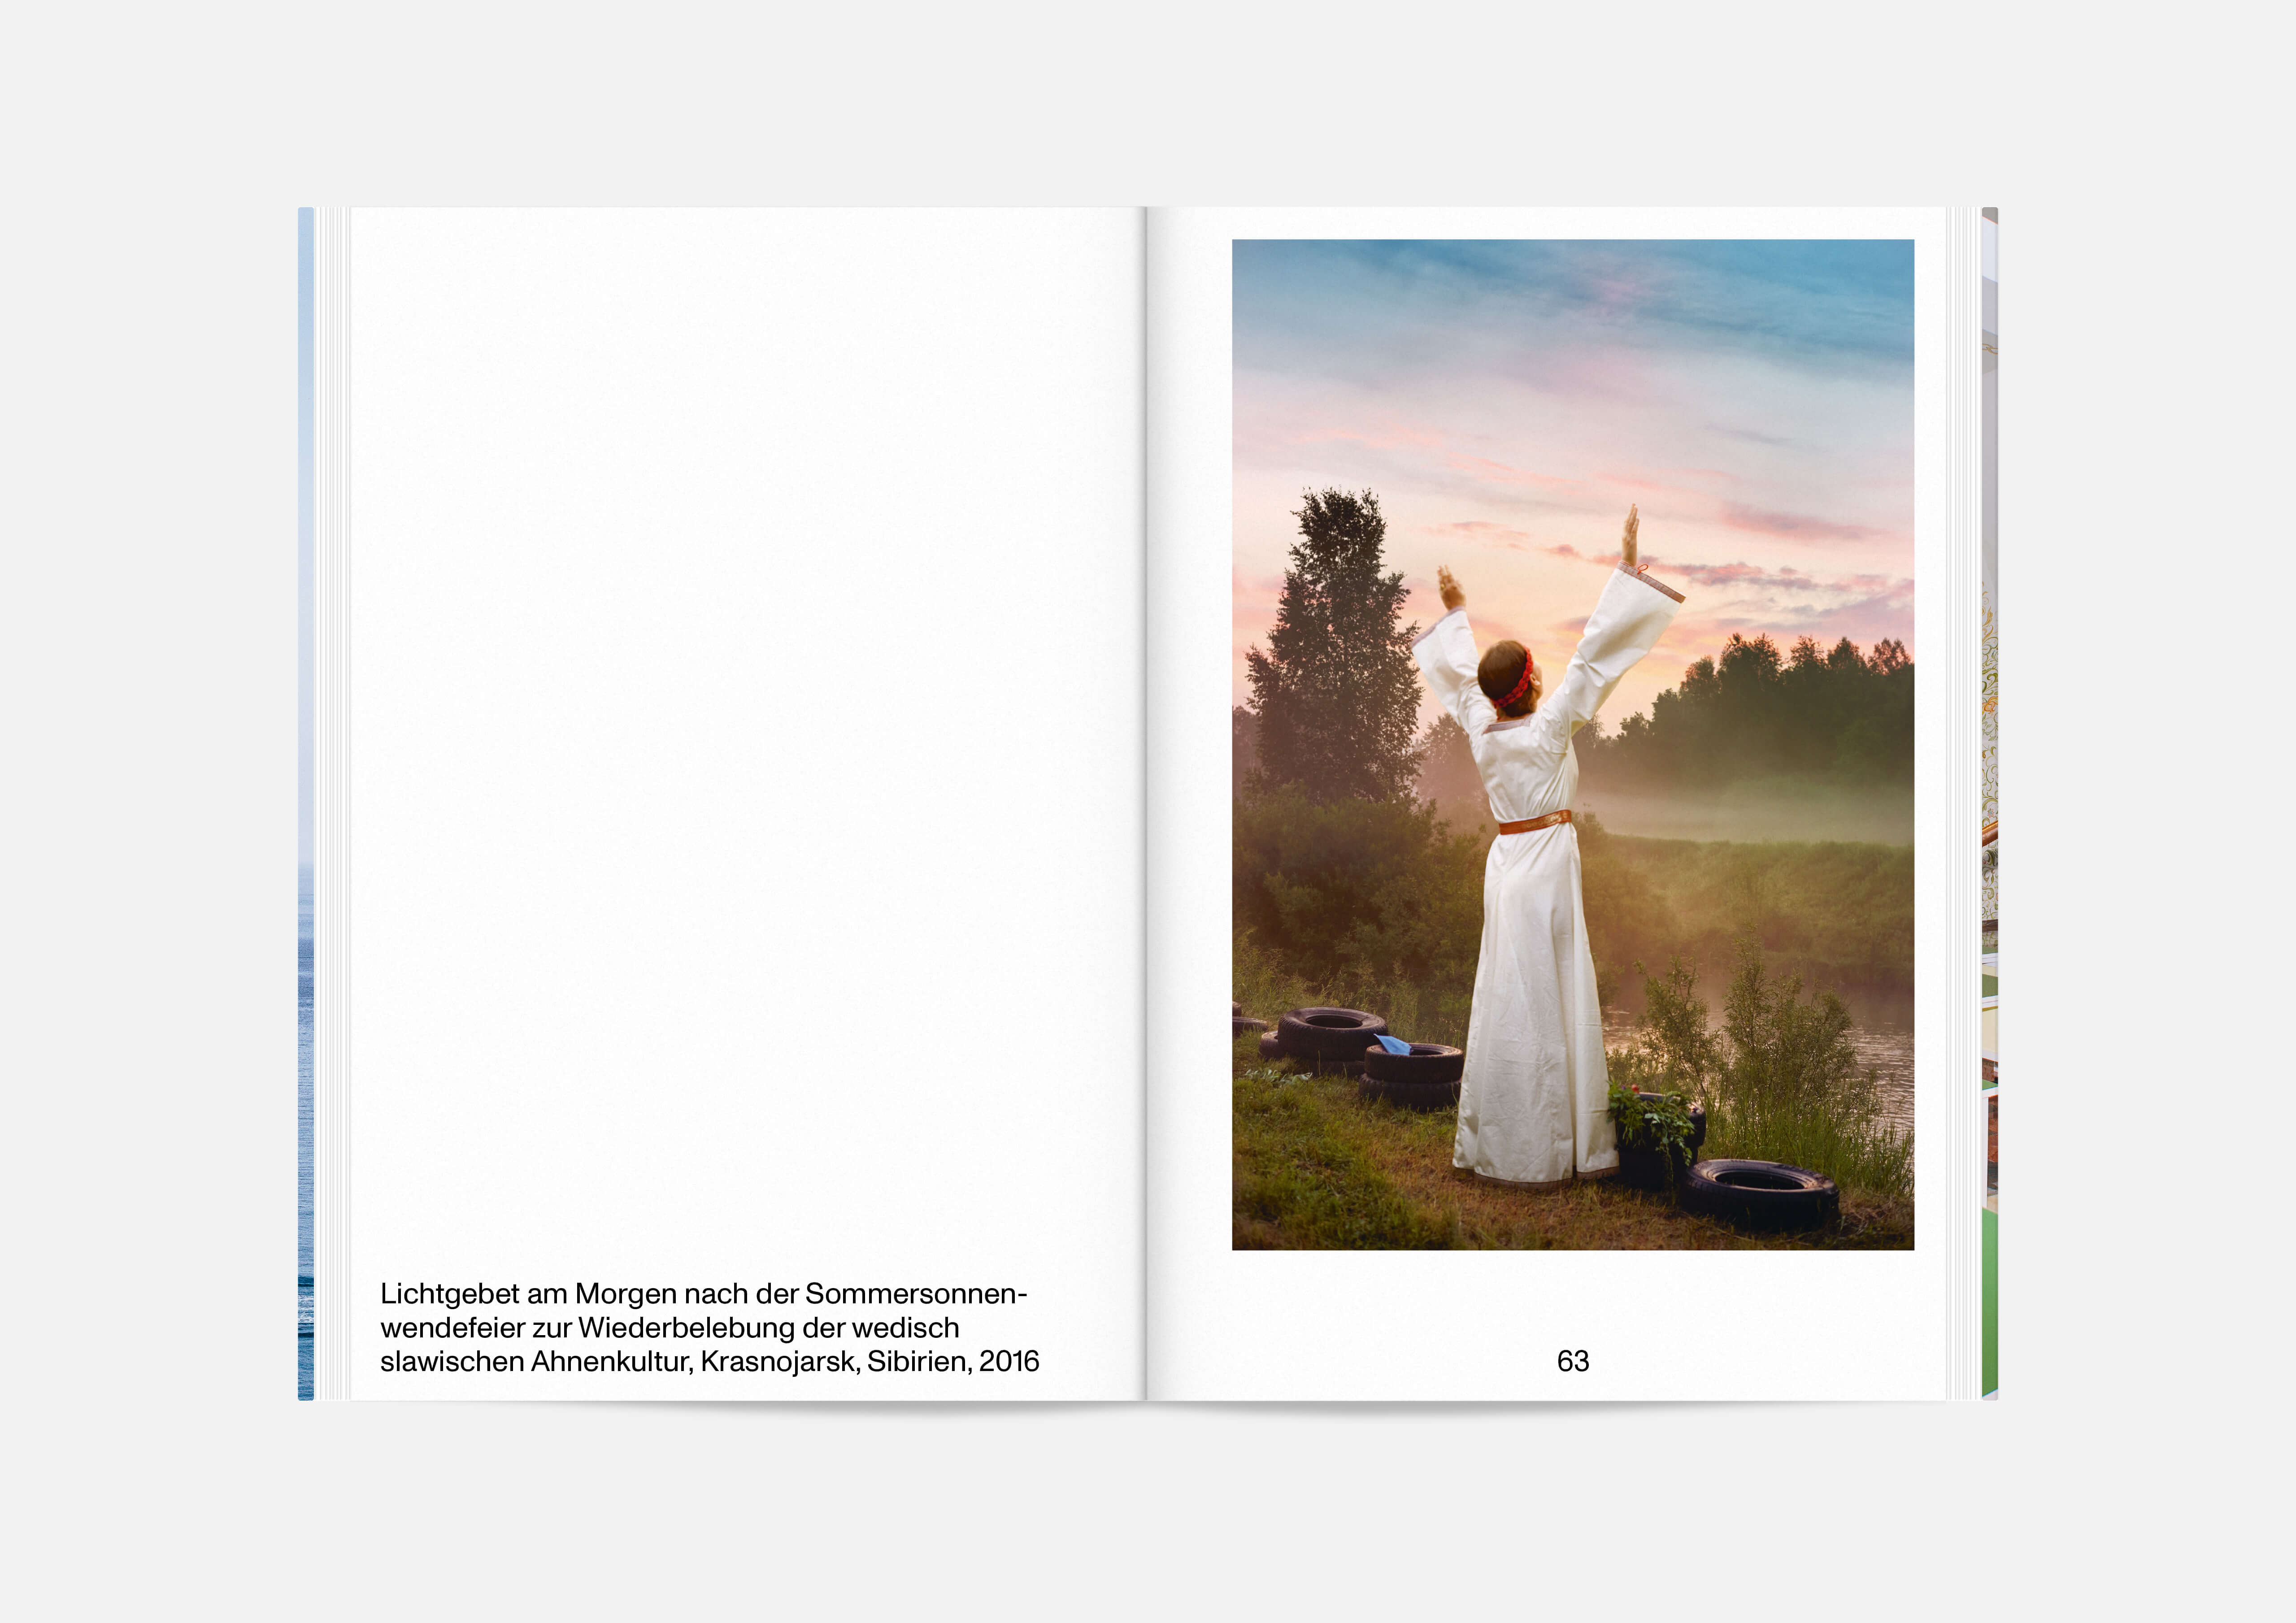 https://neuegestaltung.de/media/pages/clients/julian-roeder/c777bf67d8-1610896616/jr-glauben_13.jpg